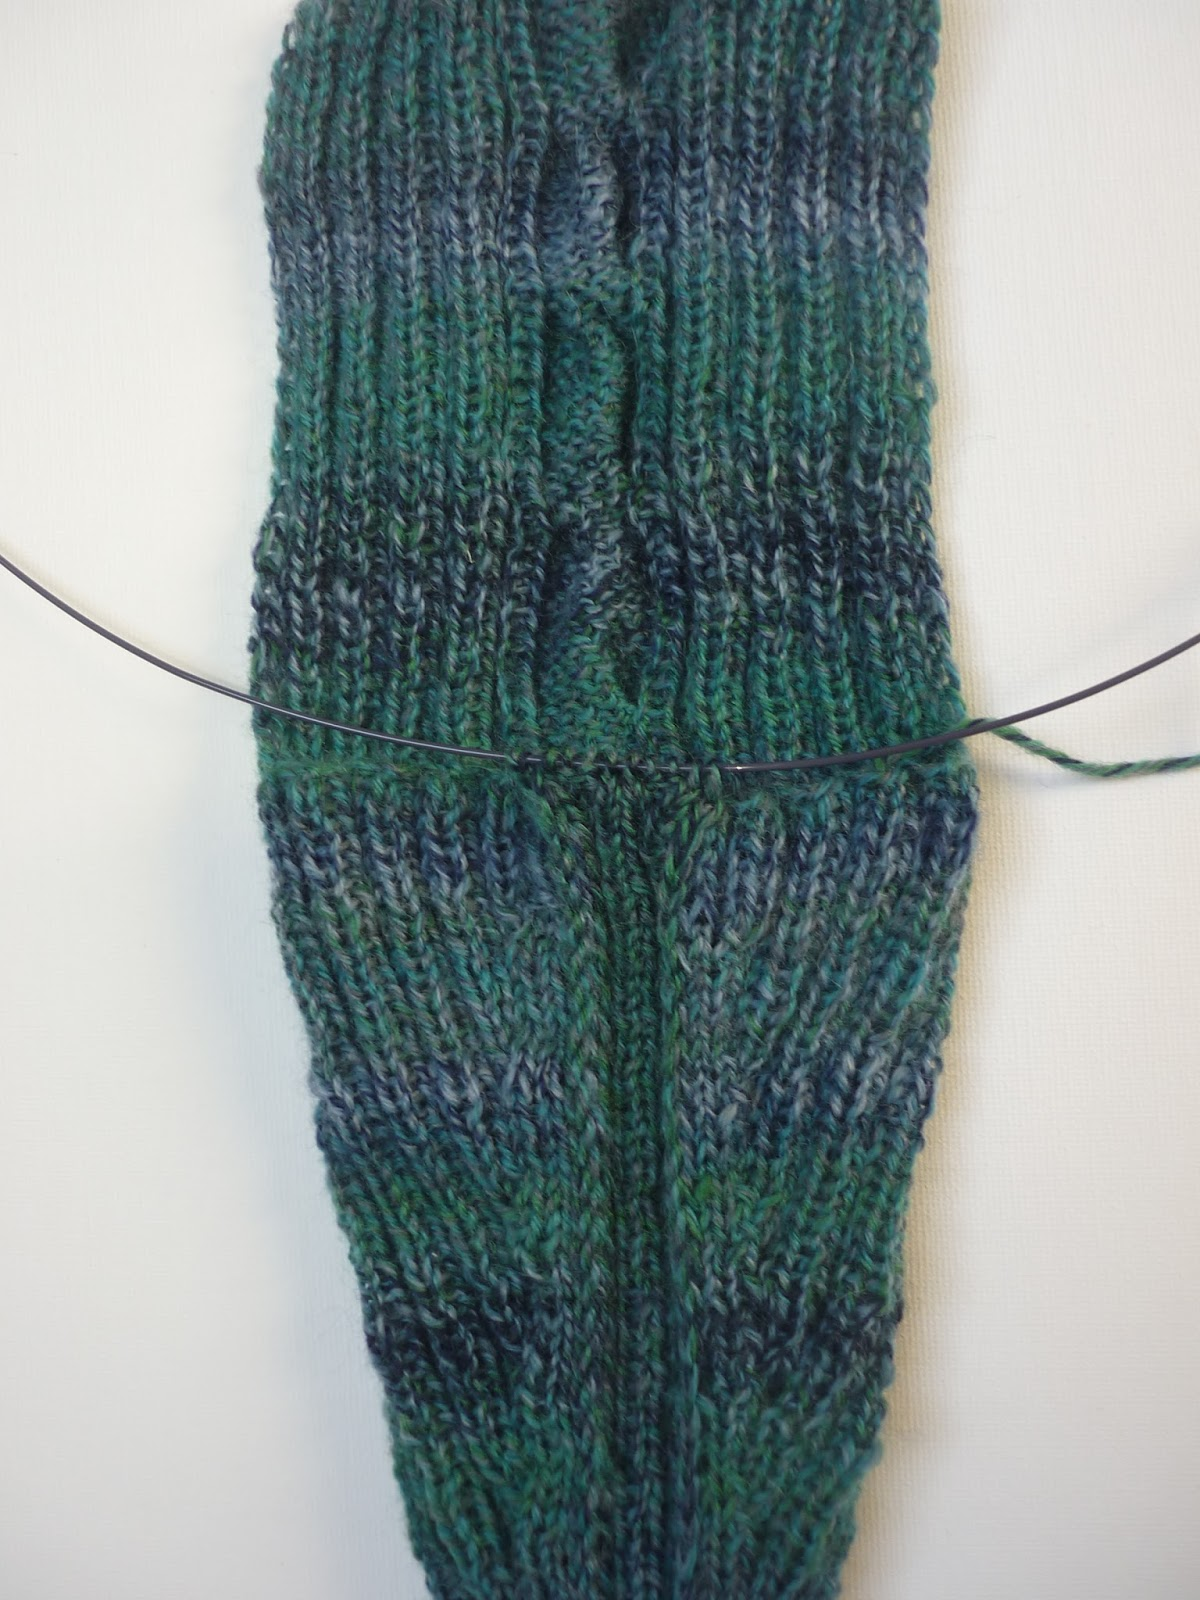 Handarbeiten Socken Auf Zwei Nadeln Ohne Naht Kurzanleitung